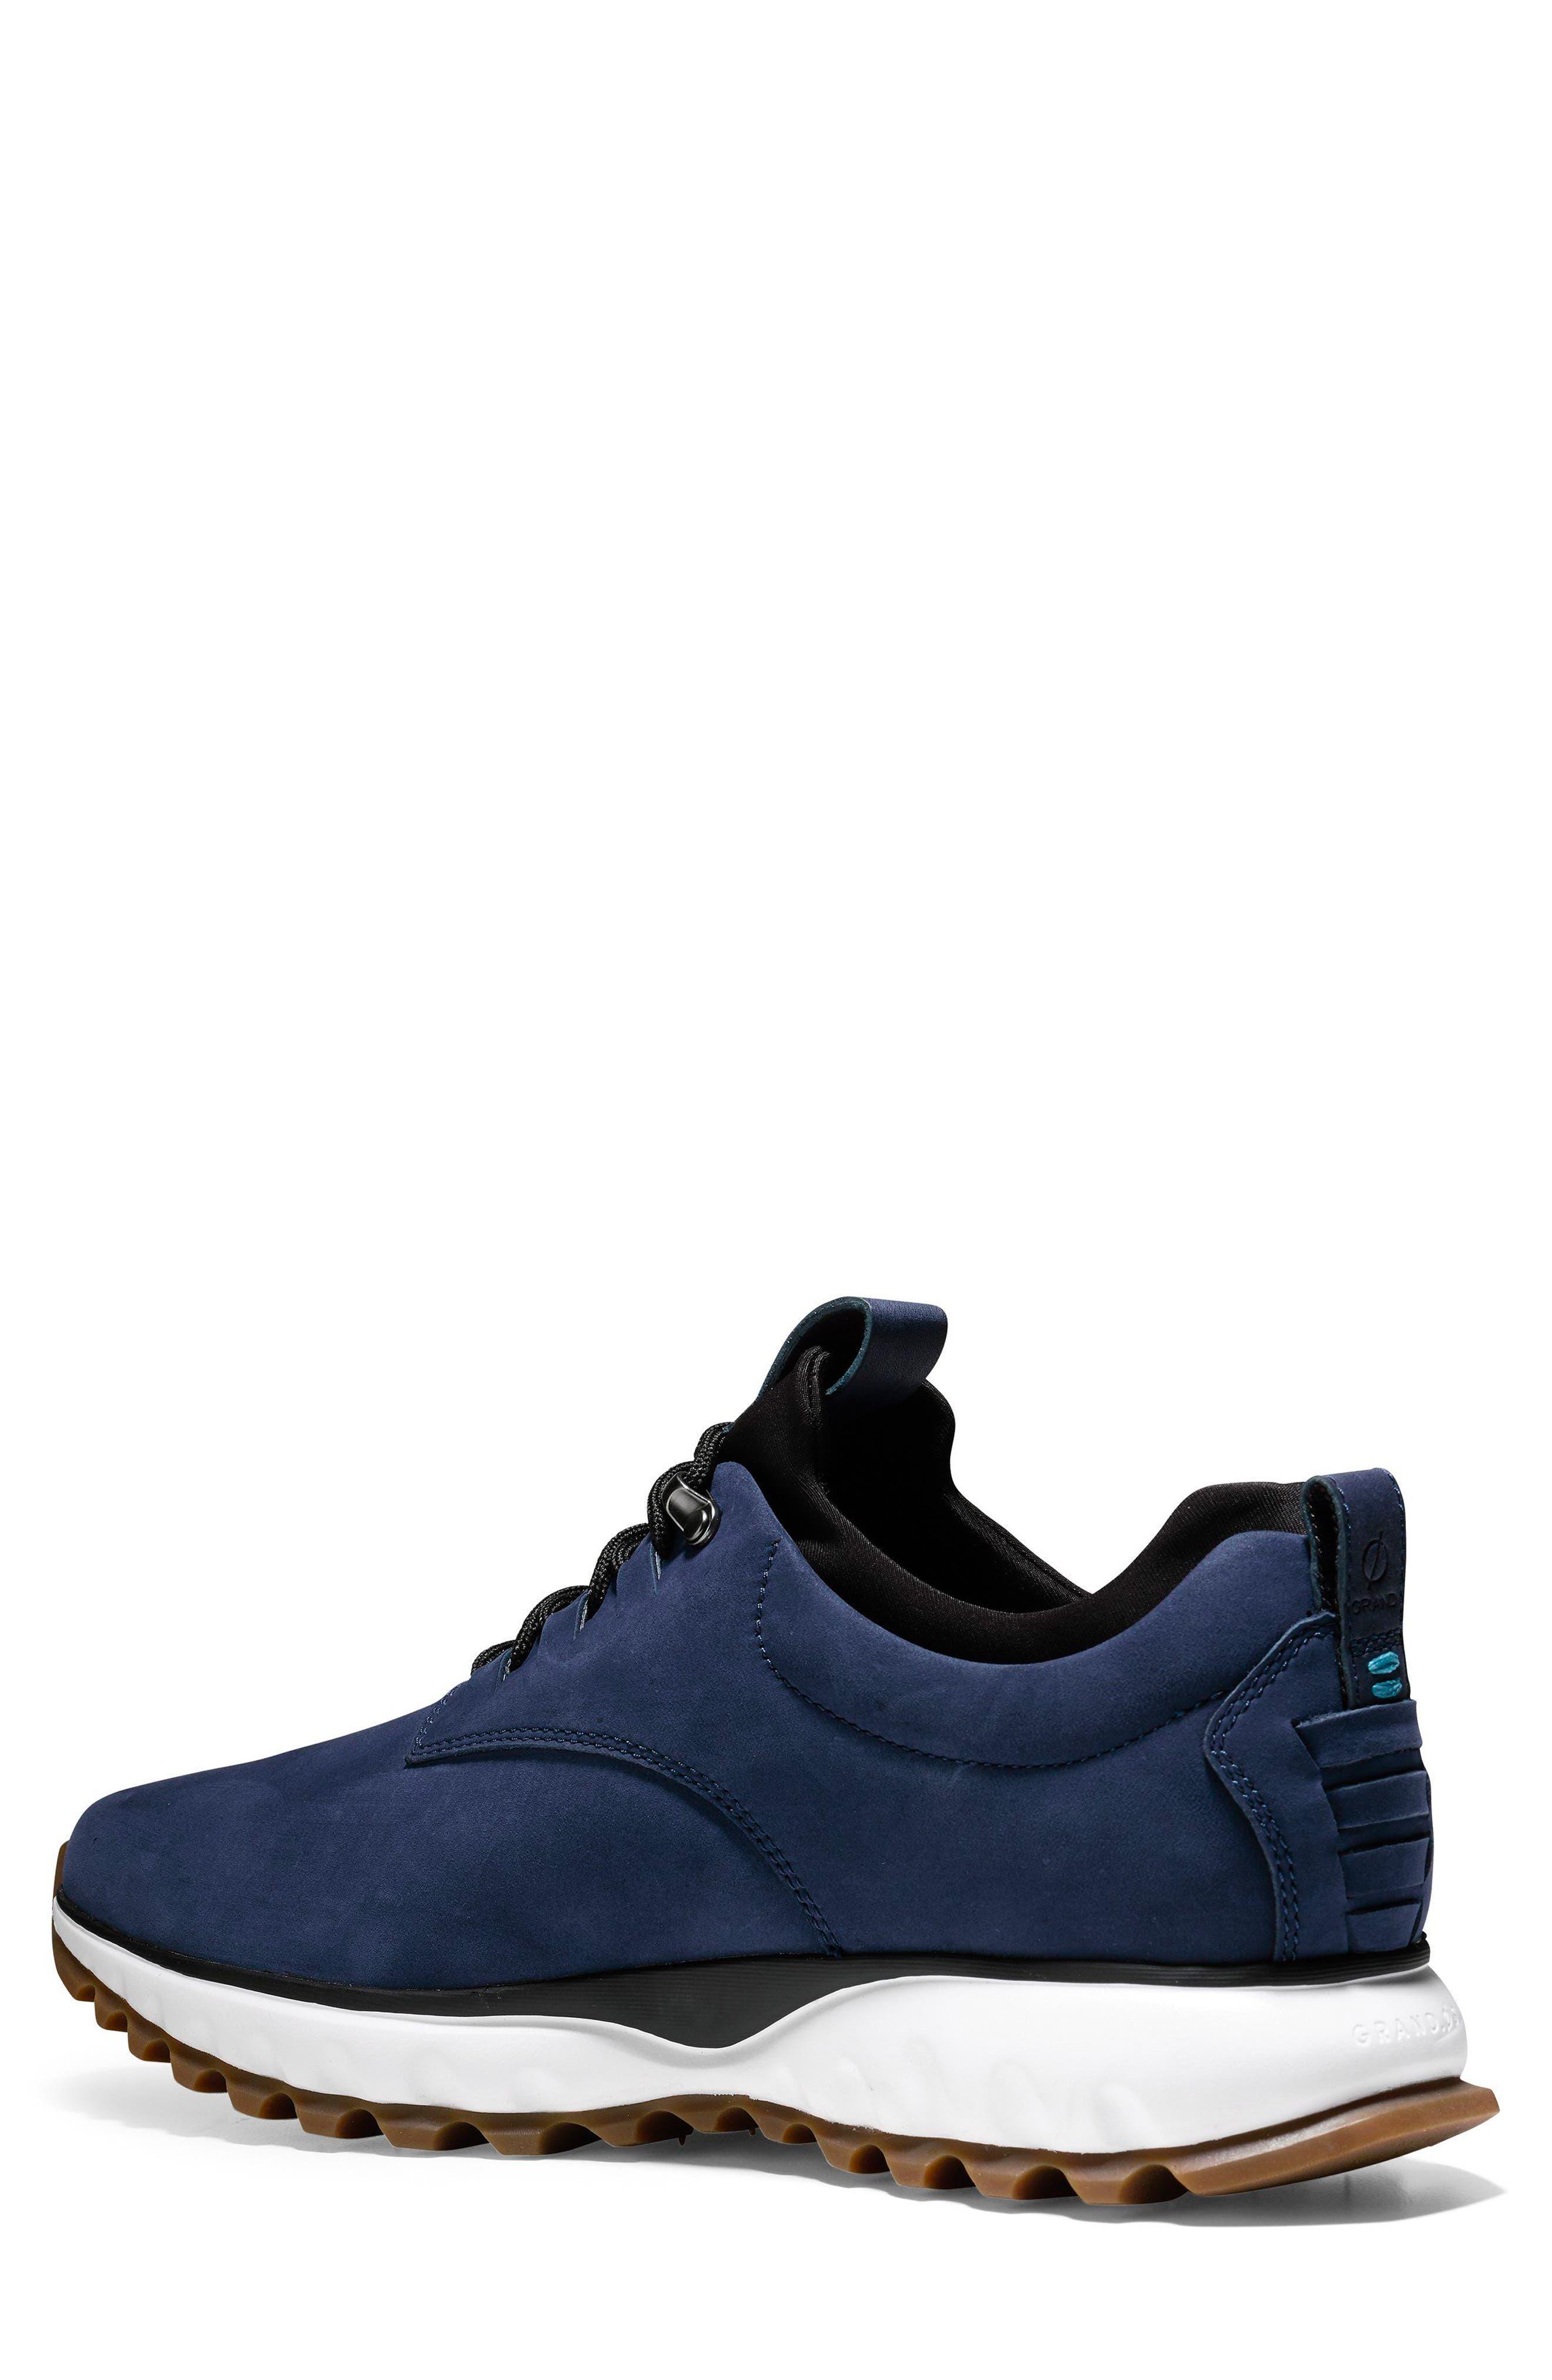 GrandExpløre All Terrain Waterproof Sneaker,                             Alternate thumbnail 6, color,